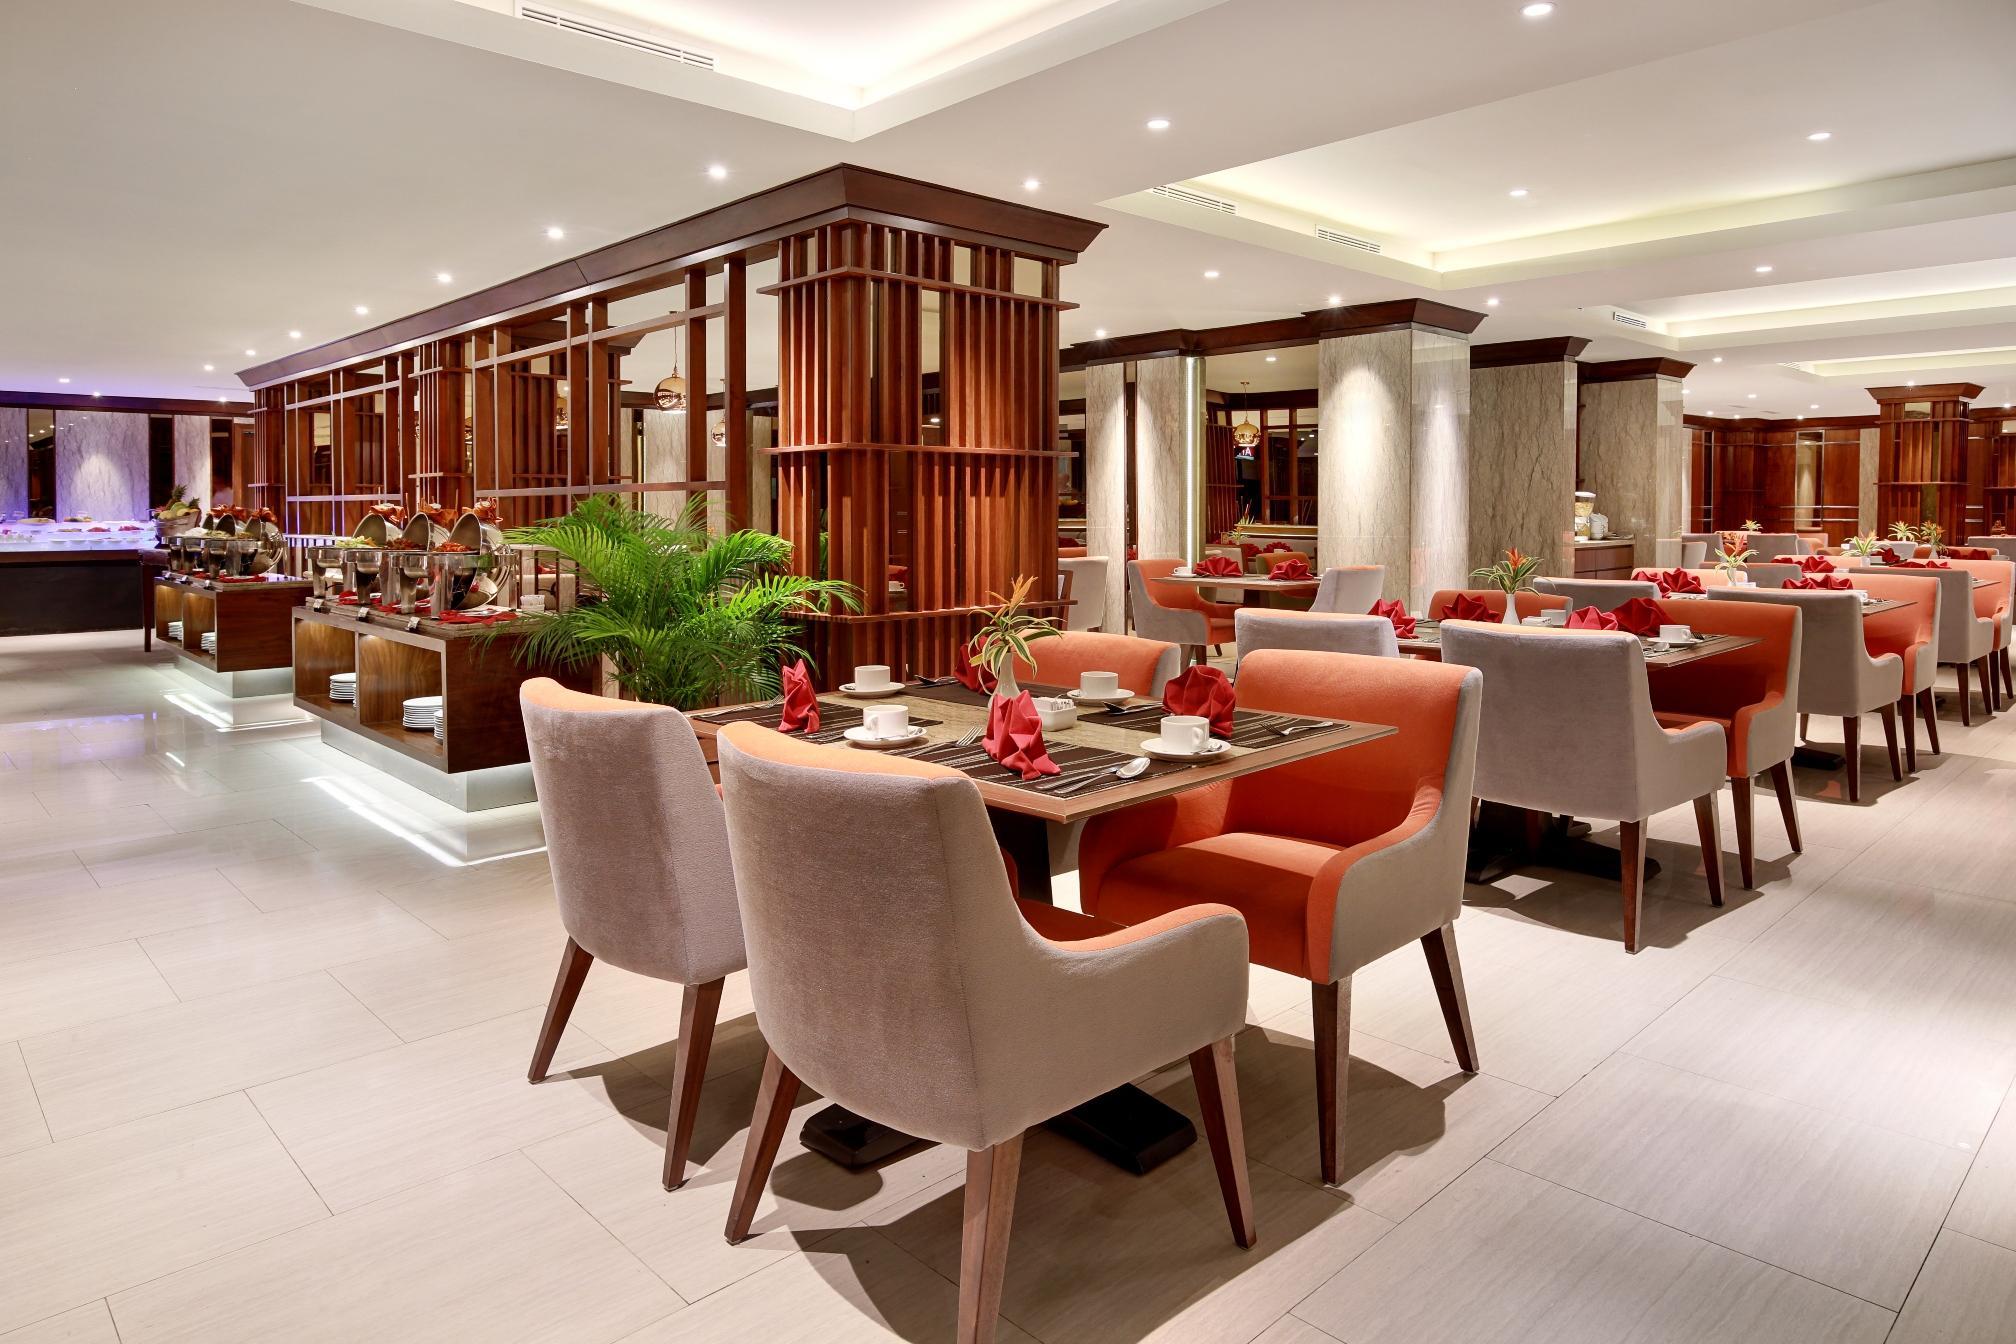 Swiss-Belhotel Borneo Banjarmasin